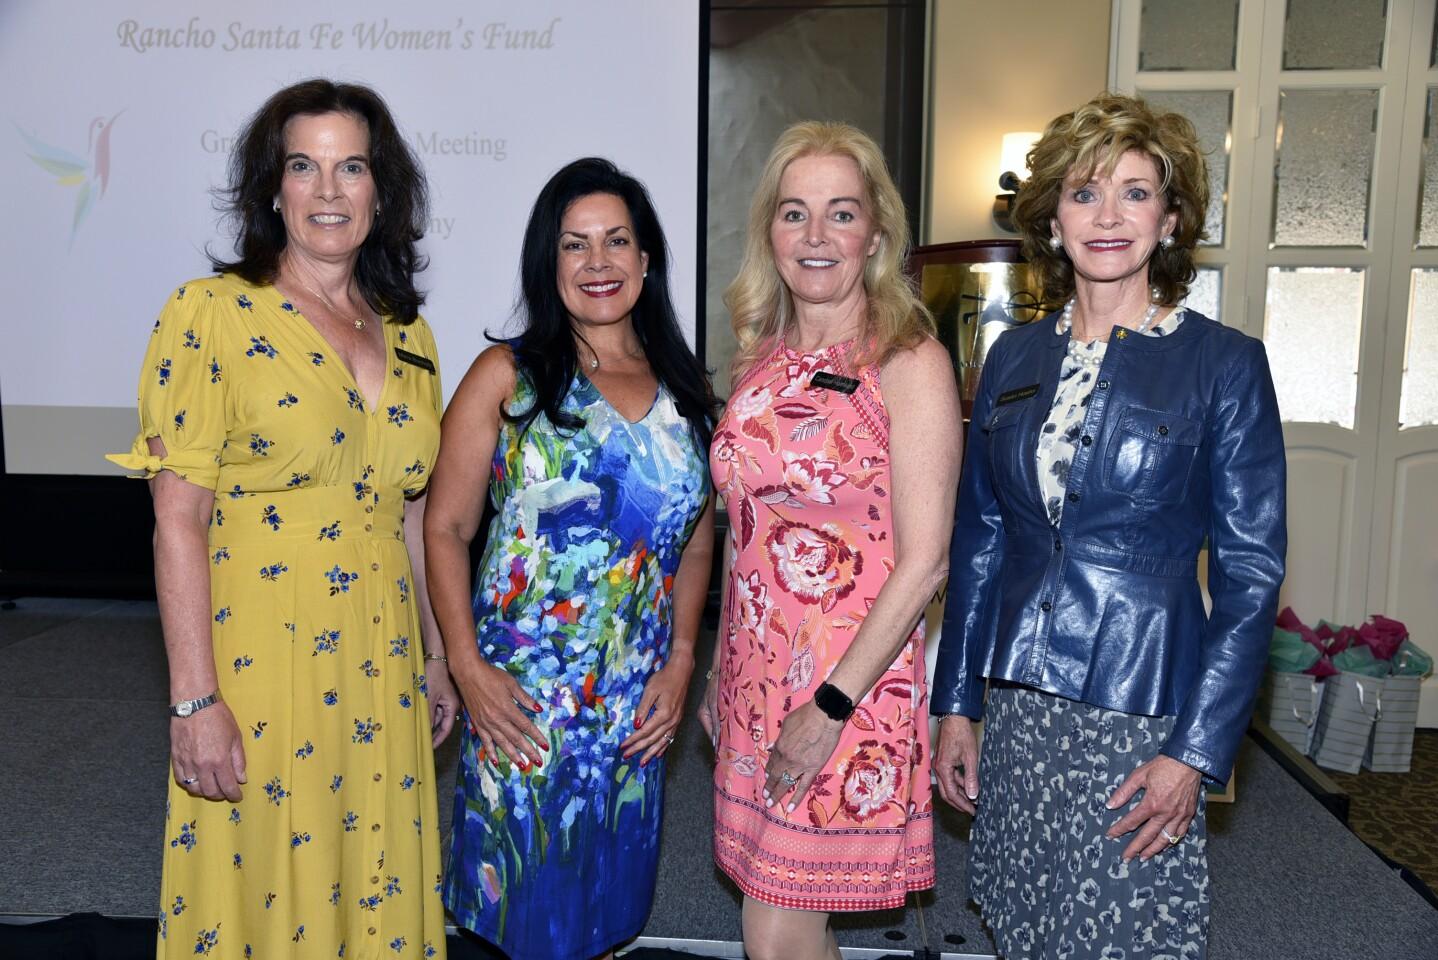 Grants Co-Chairs Mara Buchholz and Nikki Ream, Advisory Chair Candise Holmlund, Incoming Advisory Chair Susan Hoehn